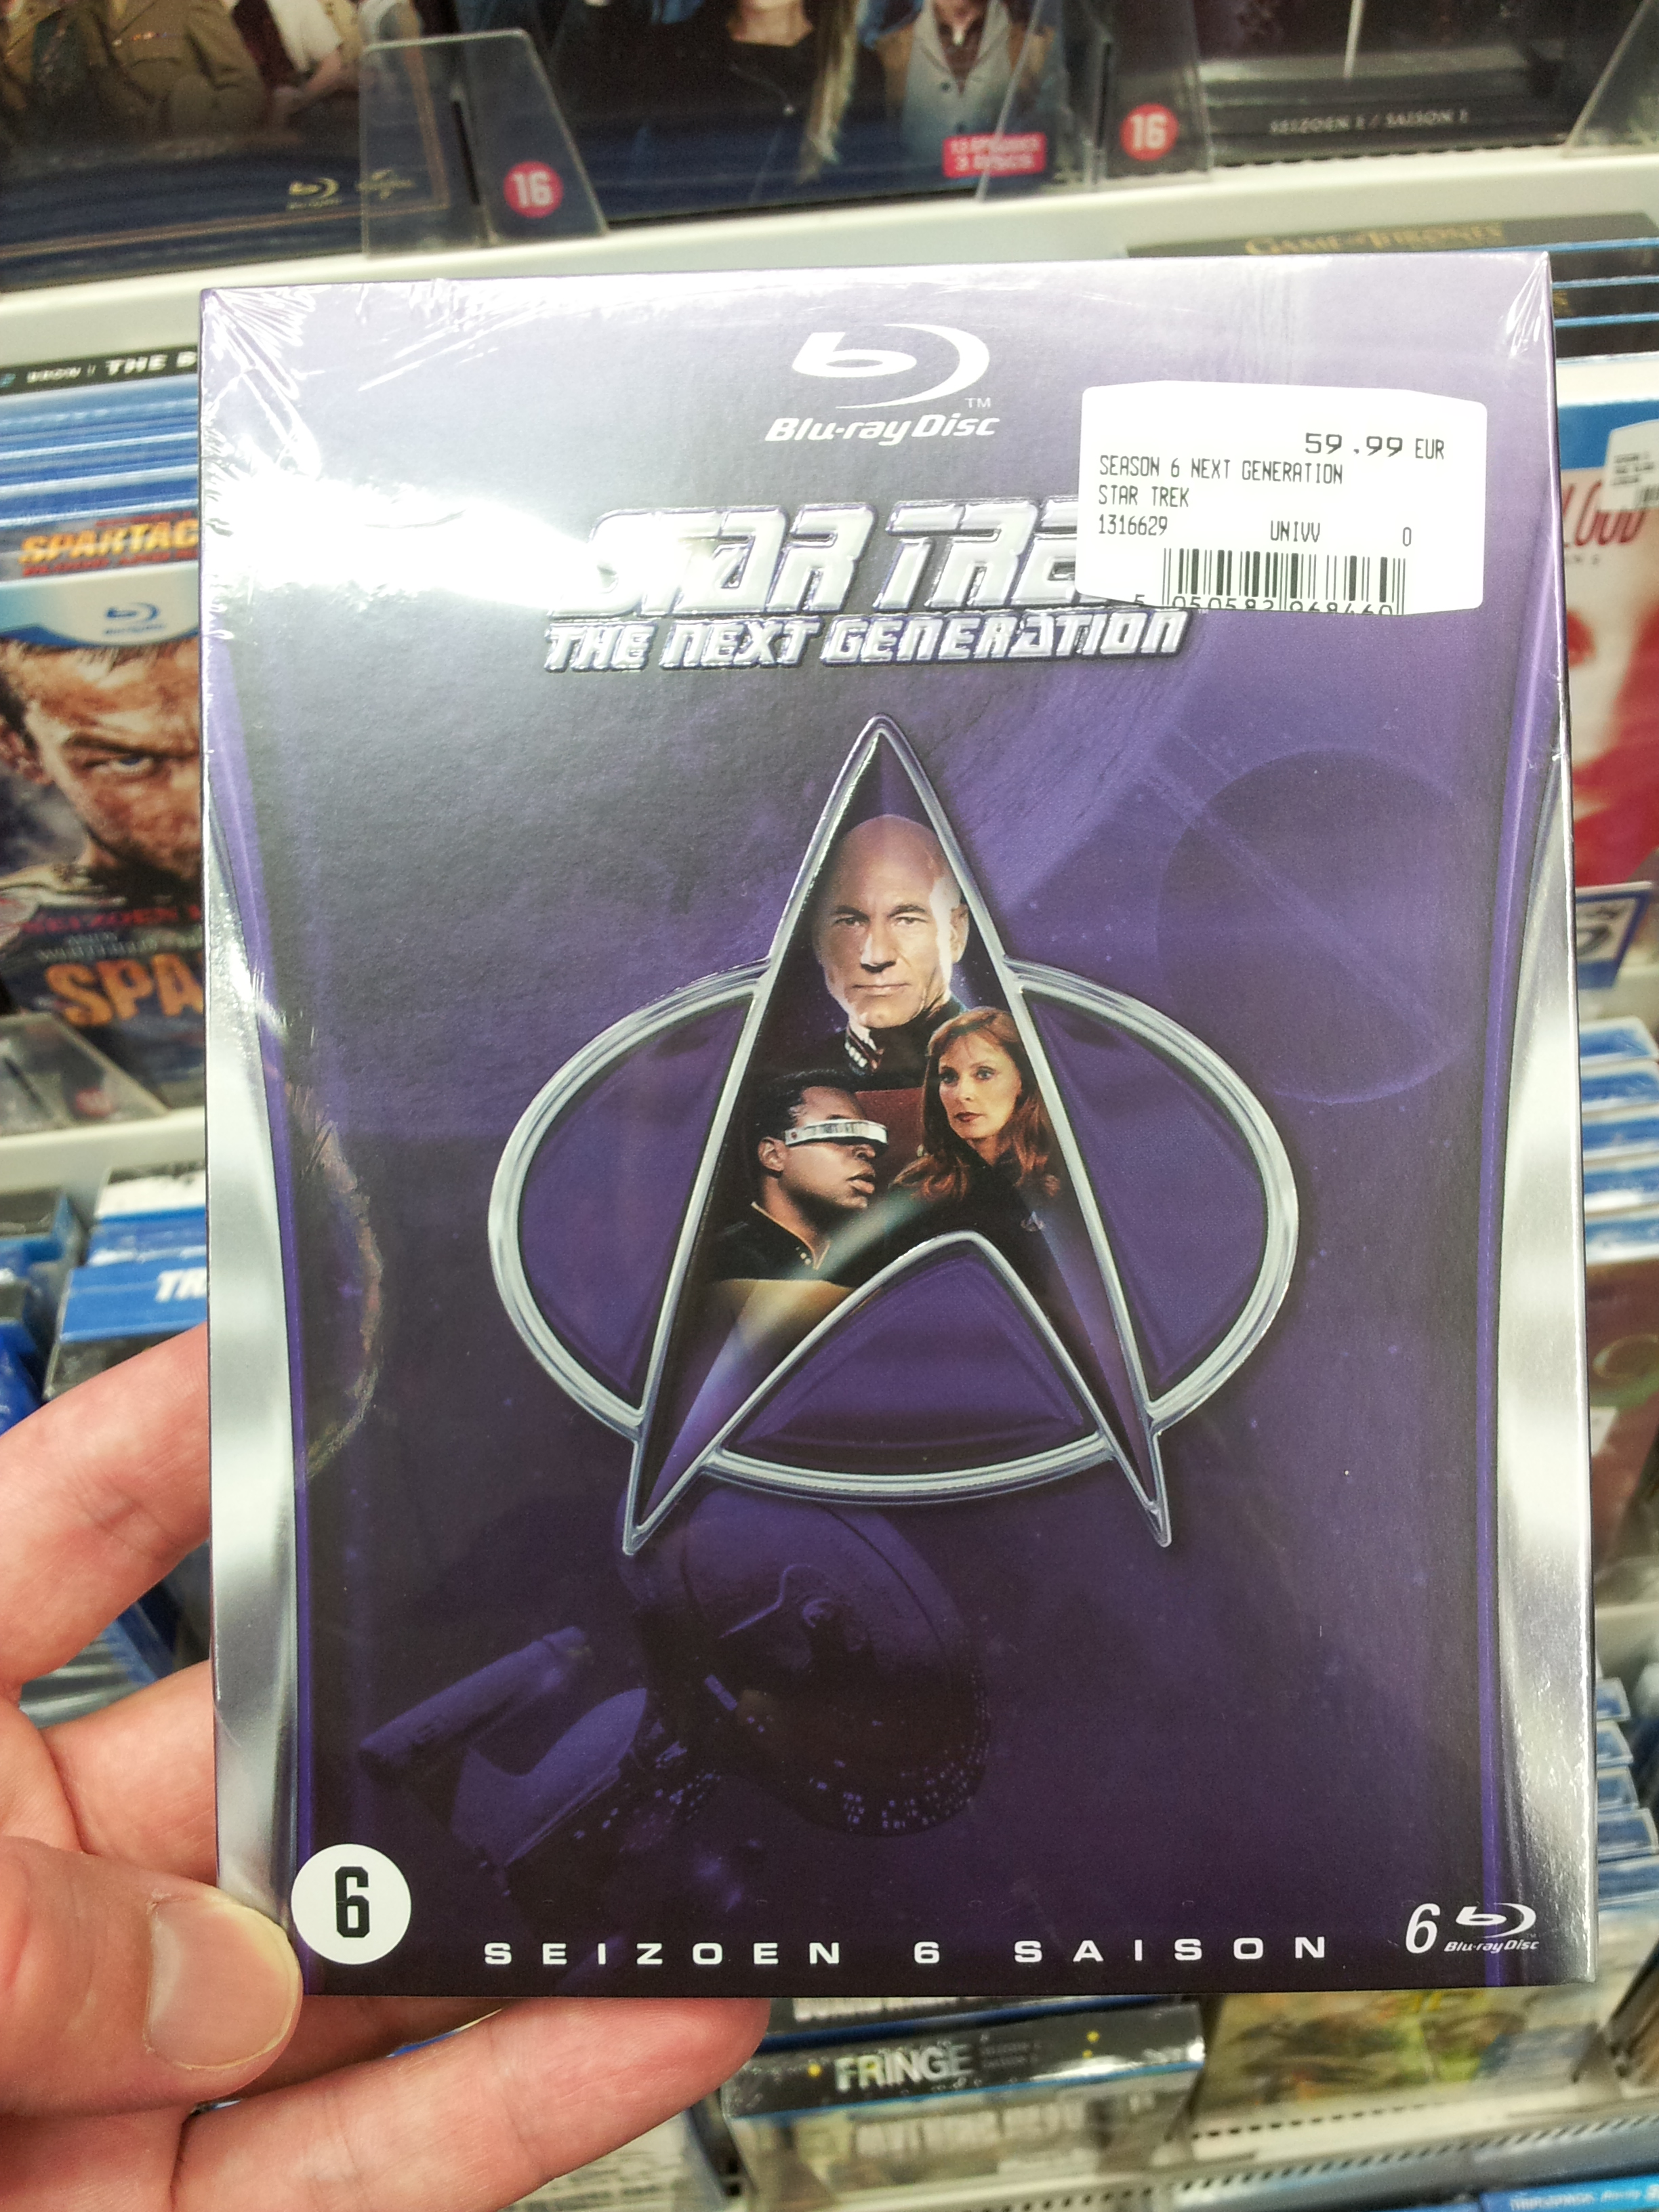 Star Trek The Next Generation Season 6 Blu-ray Review TNG season 6 boxset